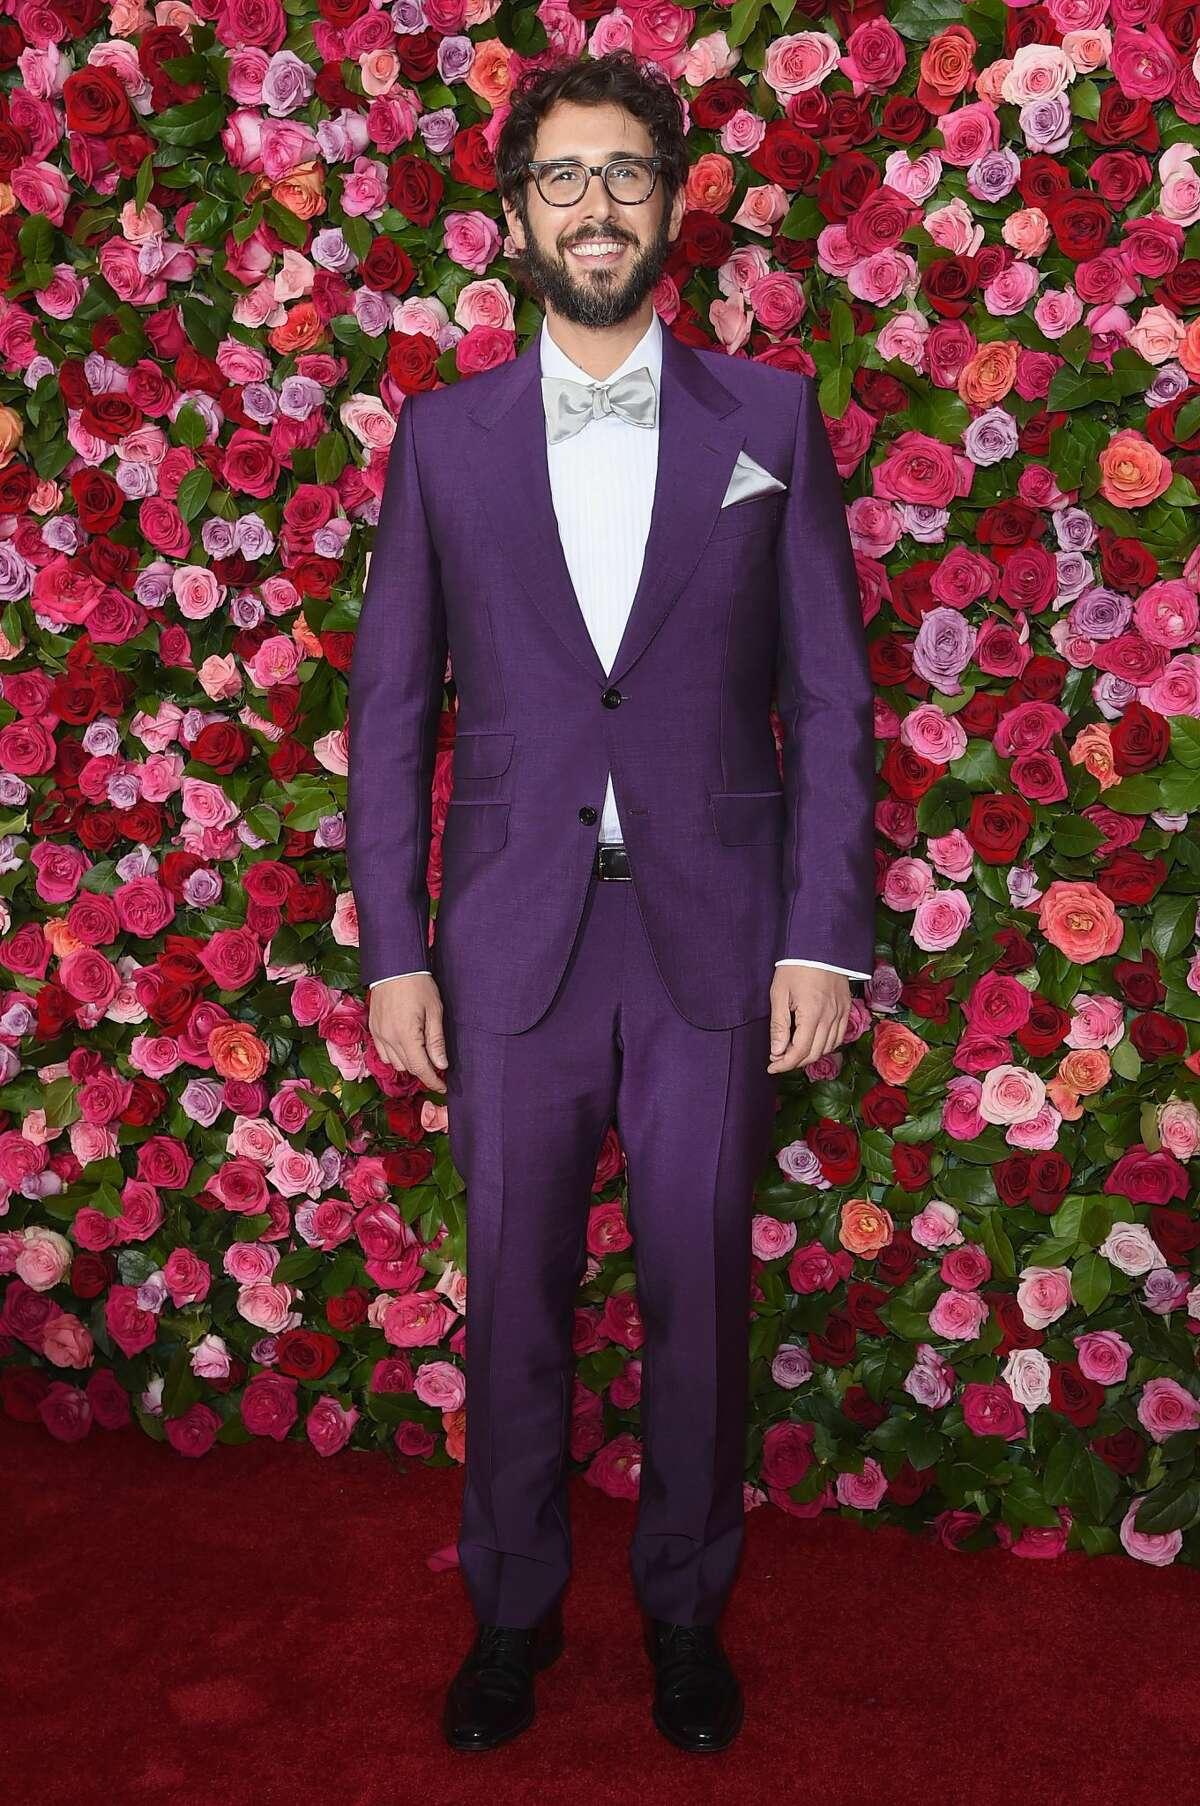 Best: Josh Groban is beaming like a gem in this beautiful purple suit.